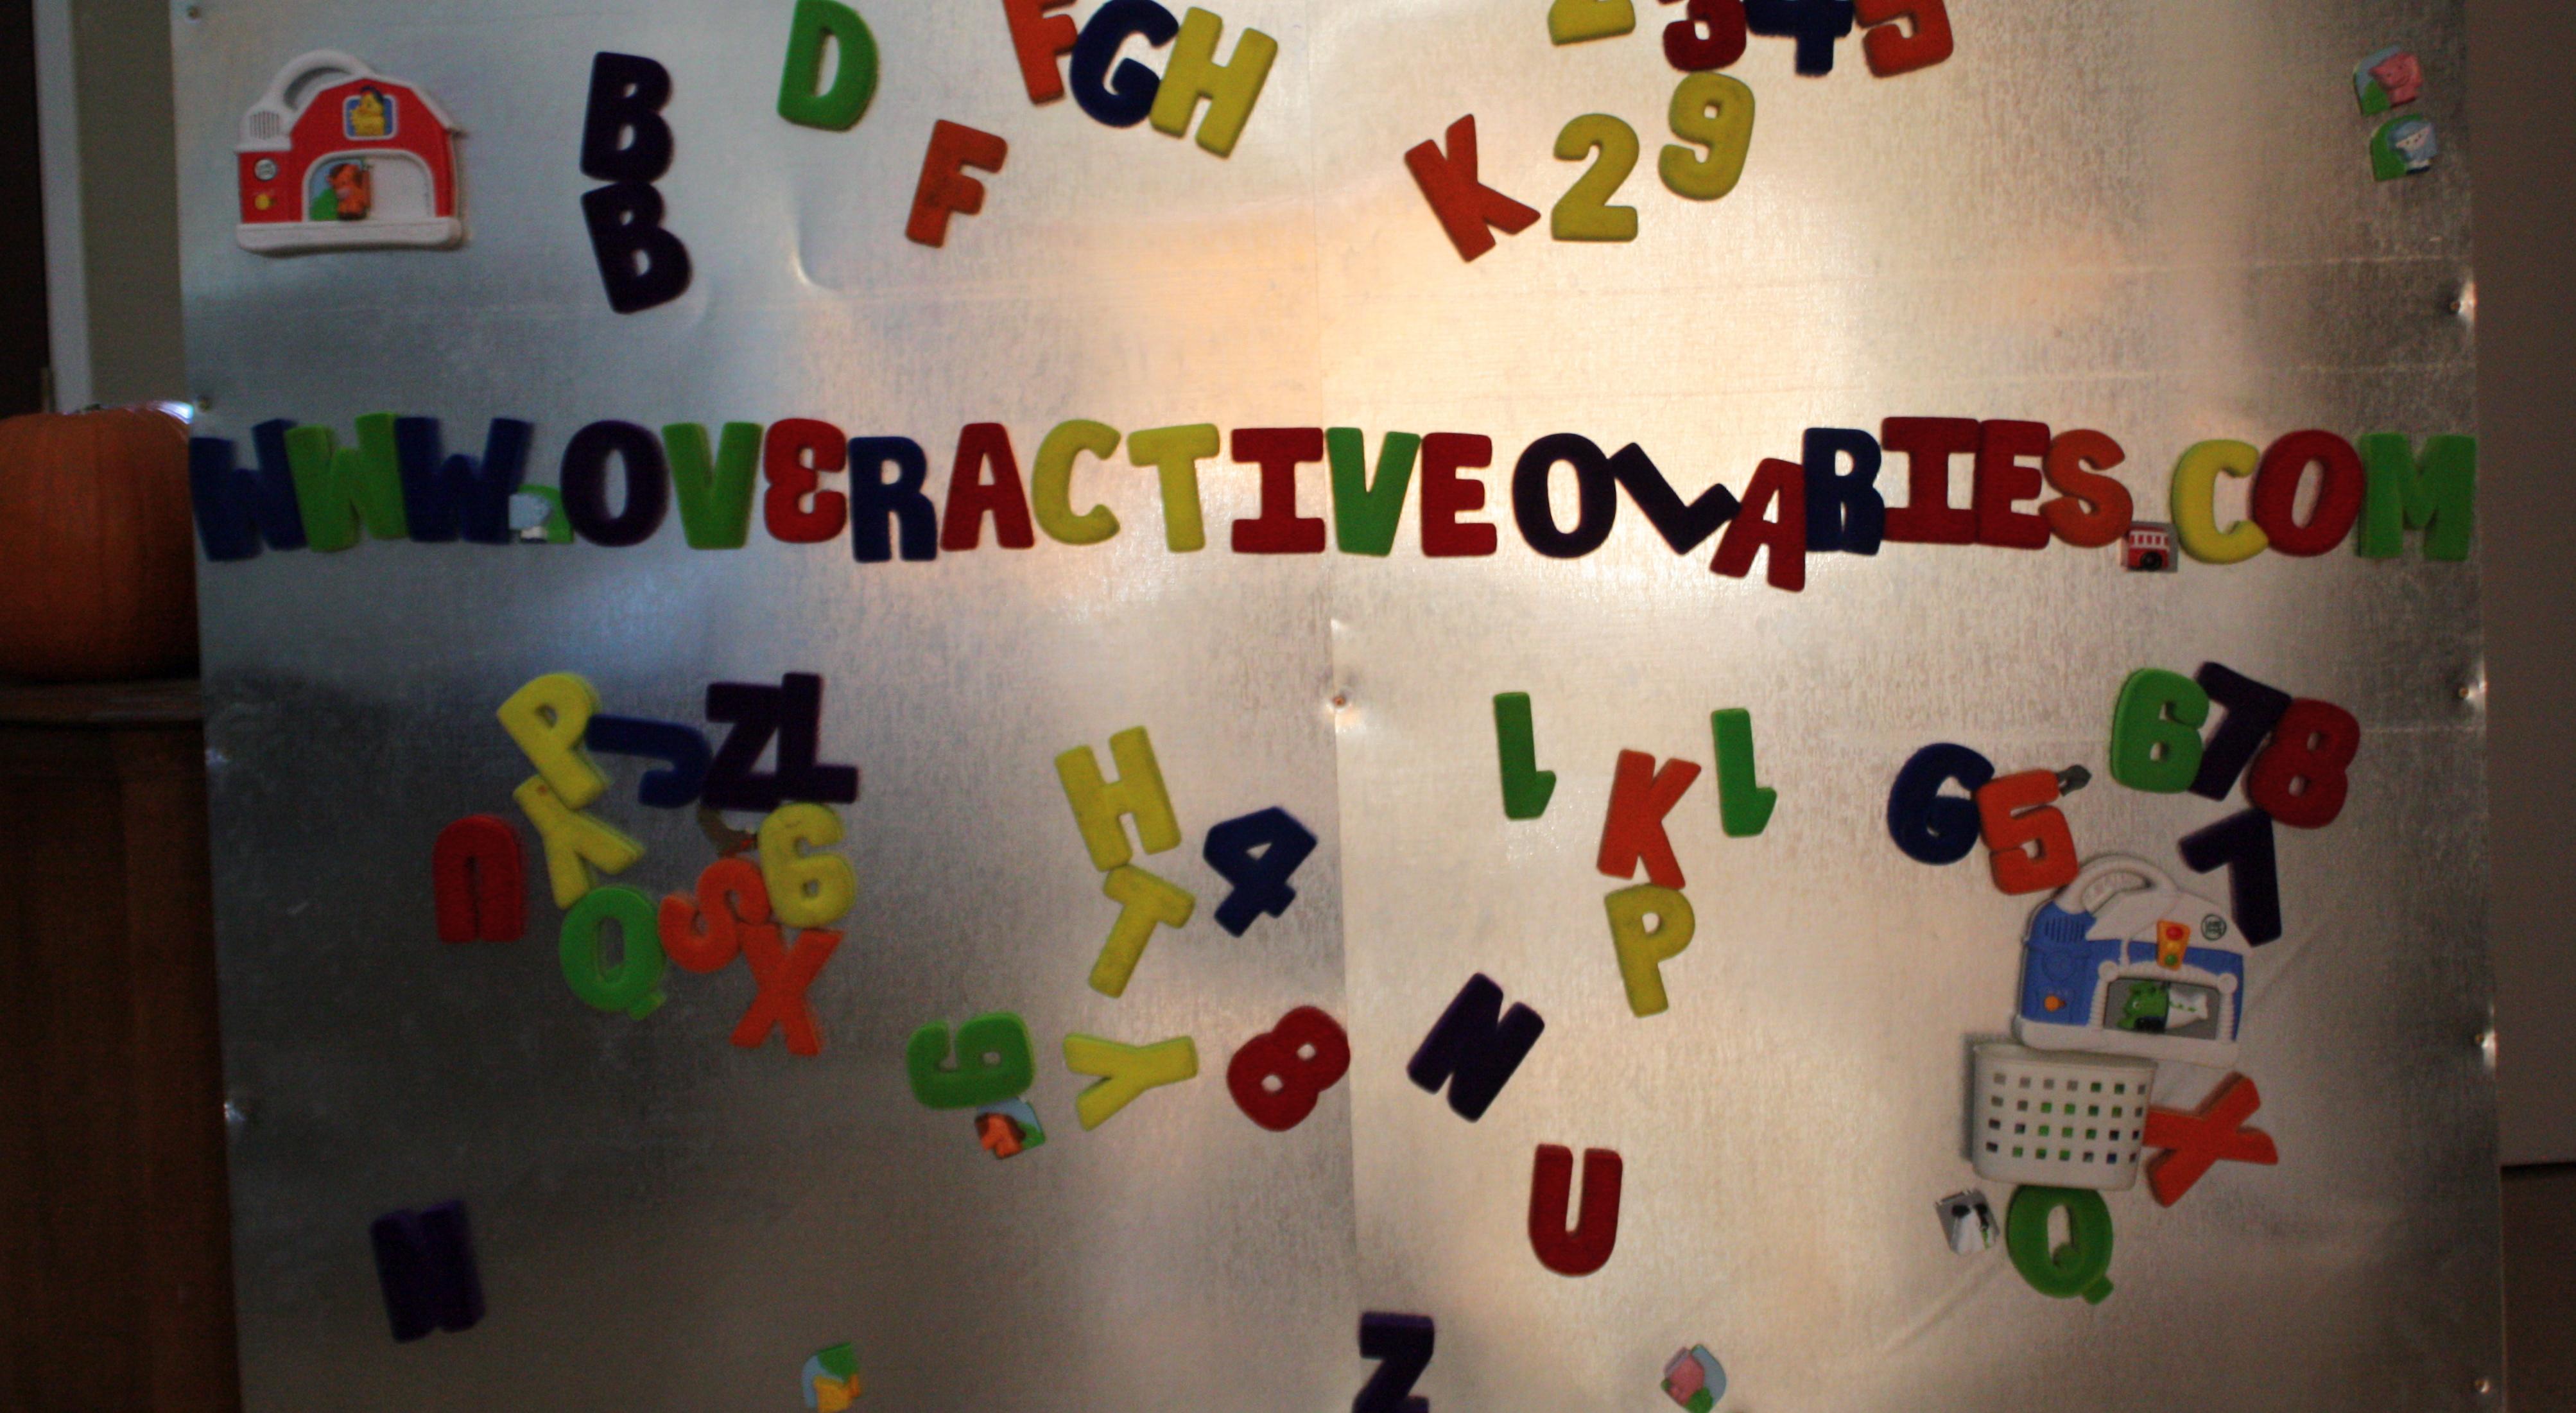 www.overactiveovaries.com